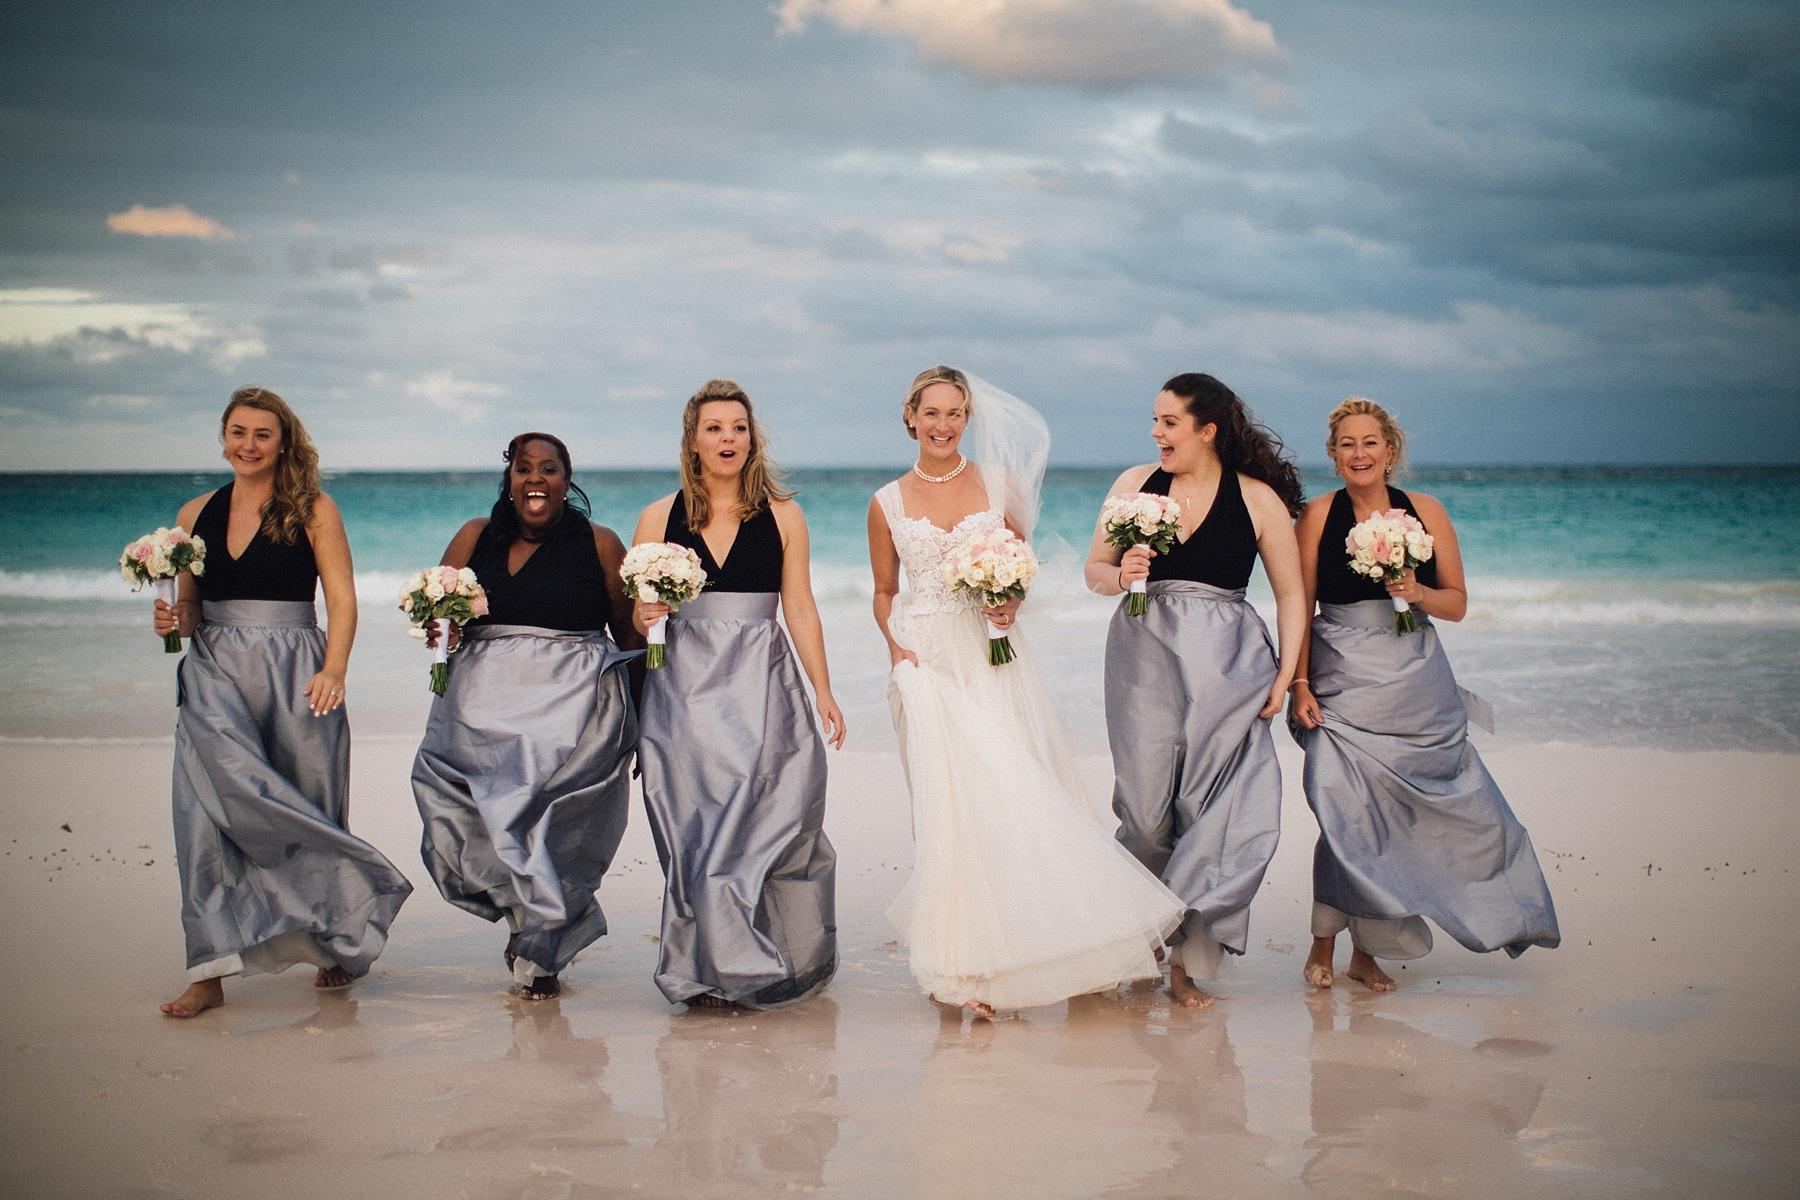 intimate-destination-wedding-beach-moments-harbour-island_0059.jpg